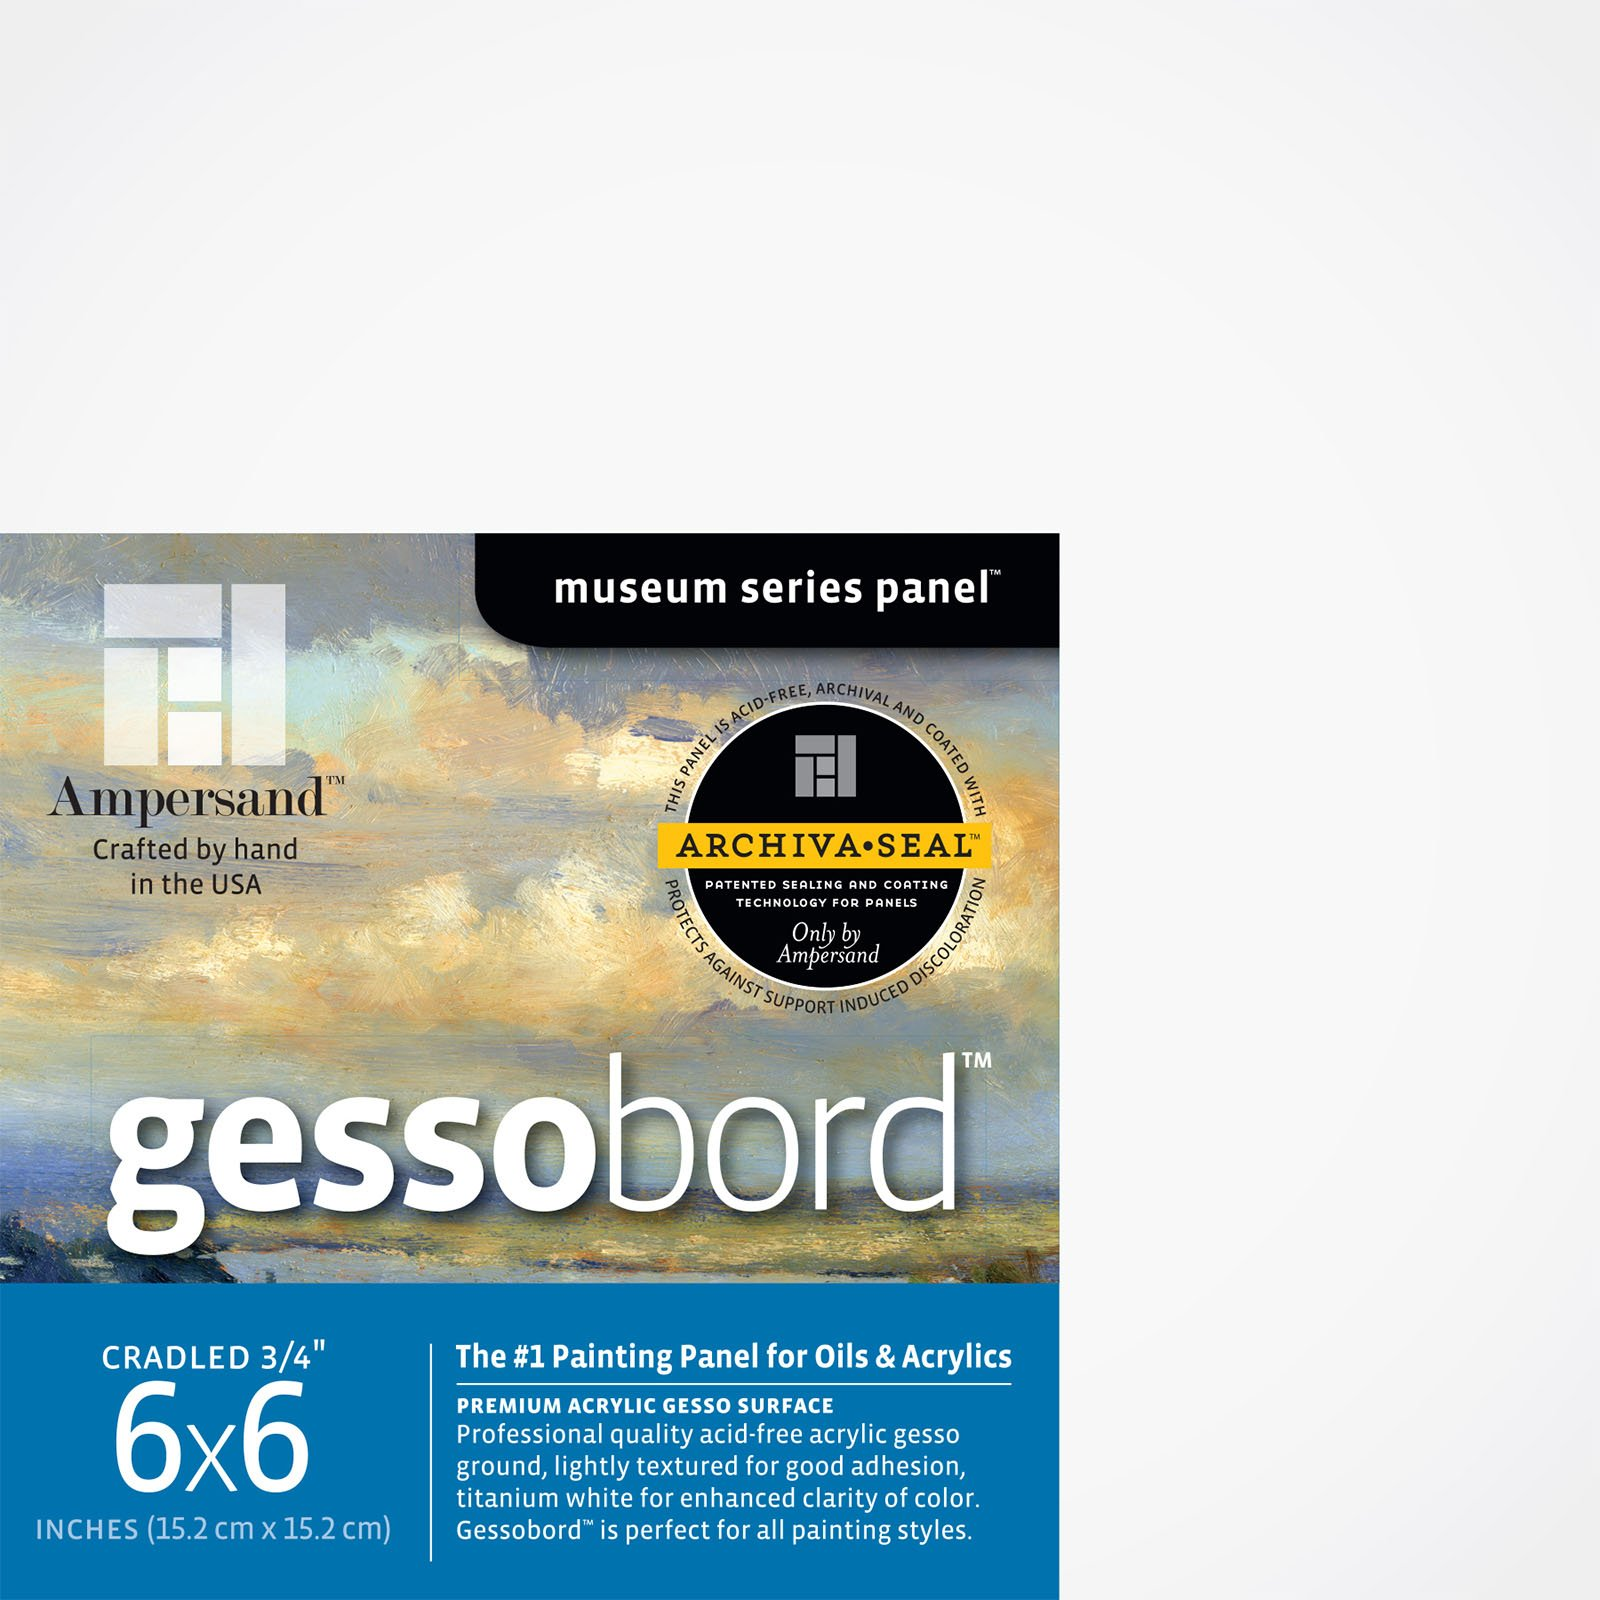 GESSOBORD 1/8IN FLAT 4PK 6X6